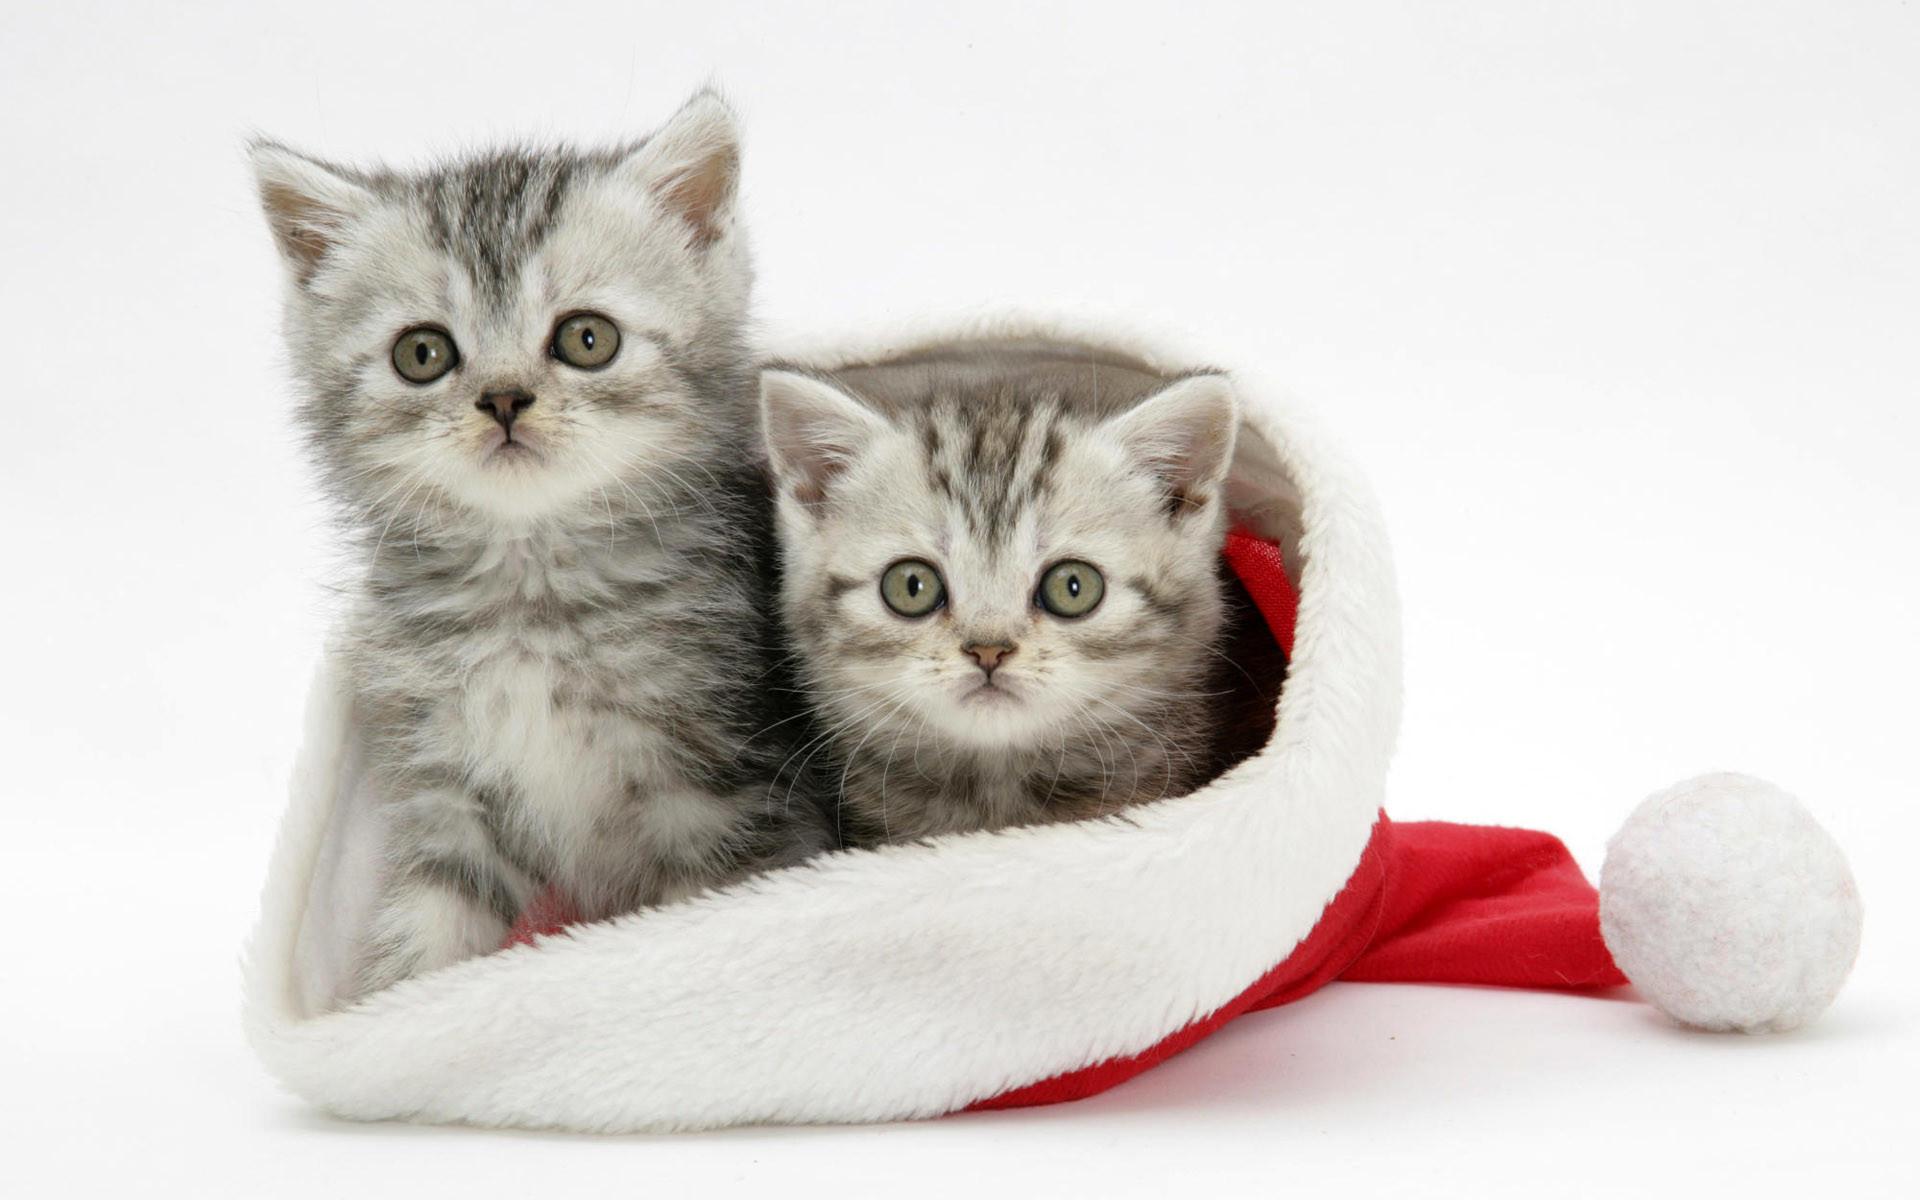 White-Cats-Christmas-Wallpaper-For-Android.jpg (1920×1200) | Wallpapers |  Pinterest | Wallpaper, Mobile wallpaper and Desktop backgrounds